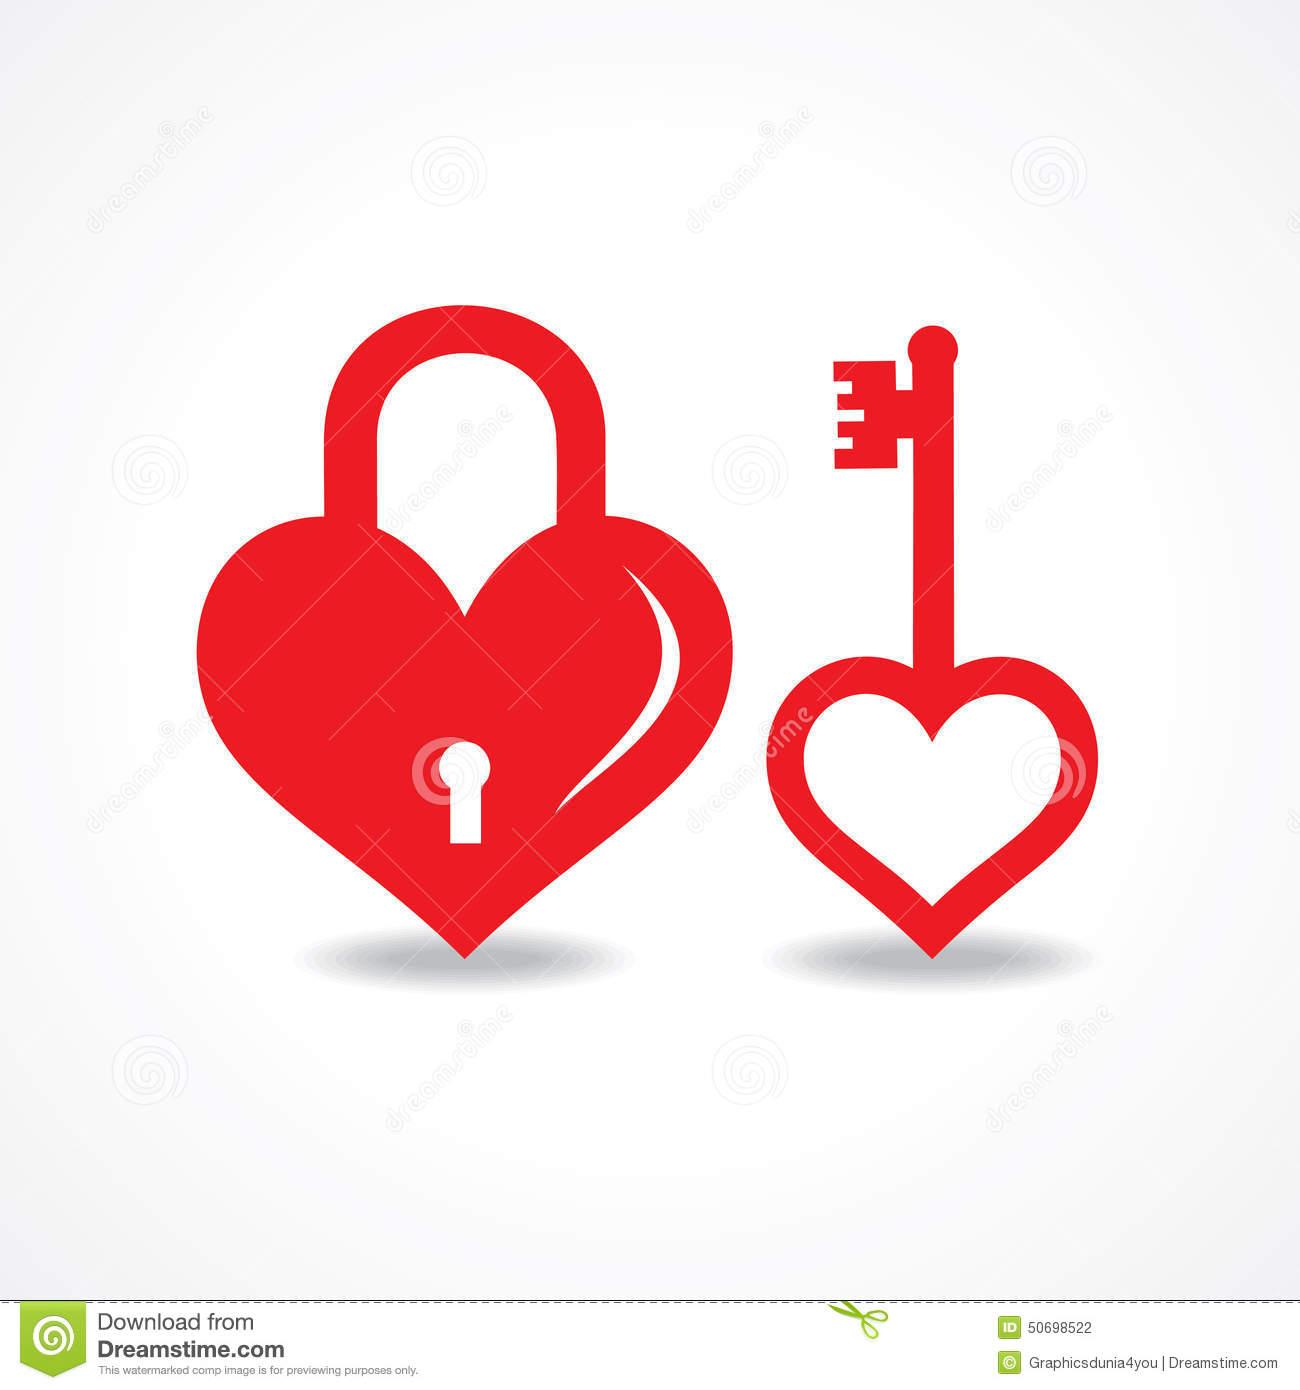 Black Rose Wallpaper 3d Super Love Heart Background 11560 Hdwpro